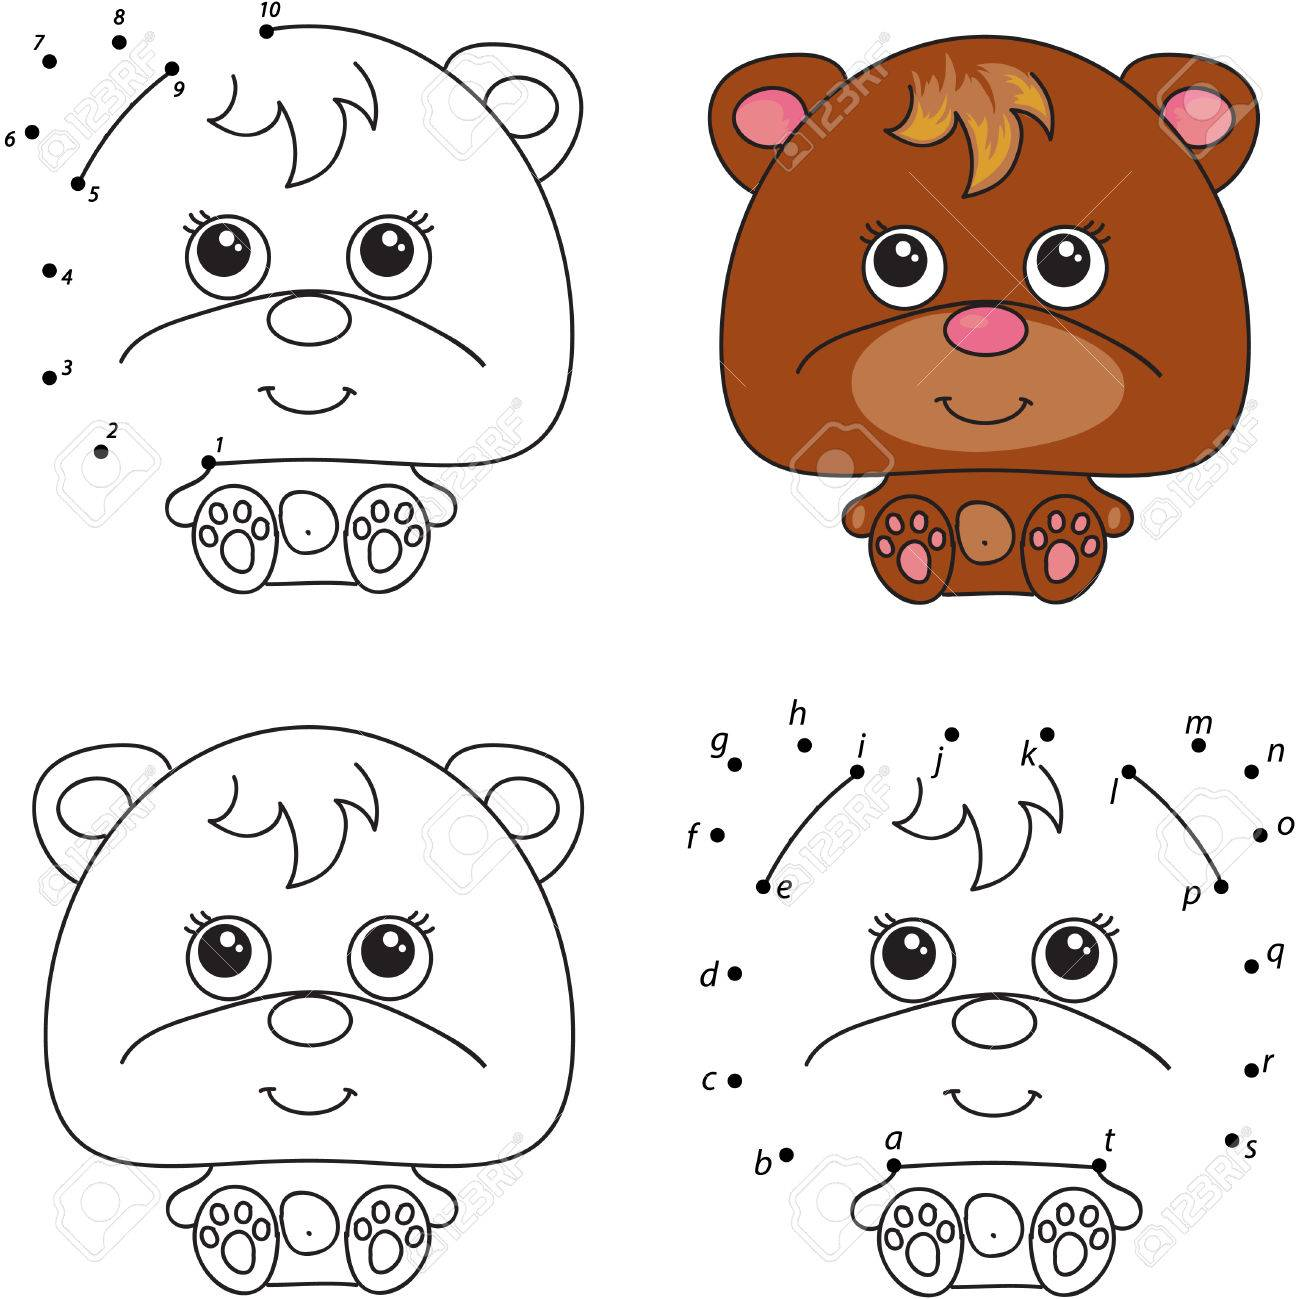 Oso De Dibujos Animados. Libro Para Colorear Y Punto A Punto Juego ...